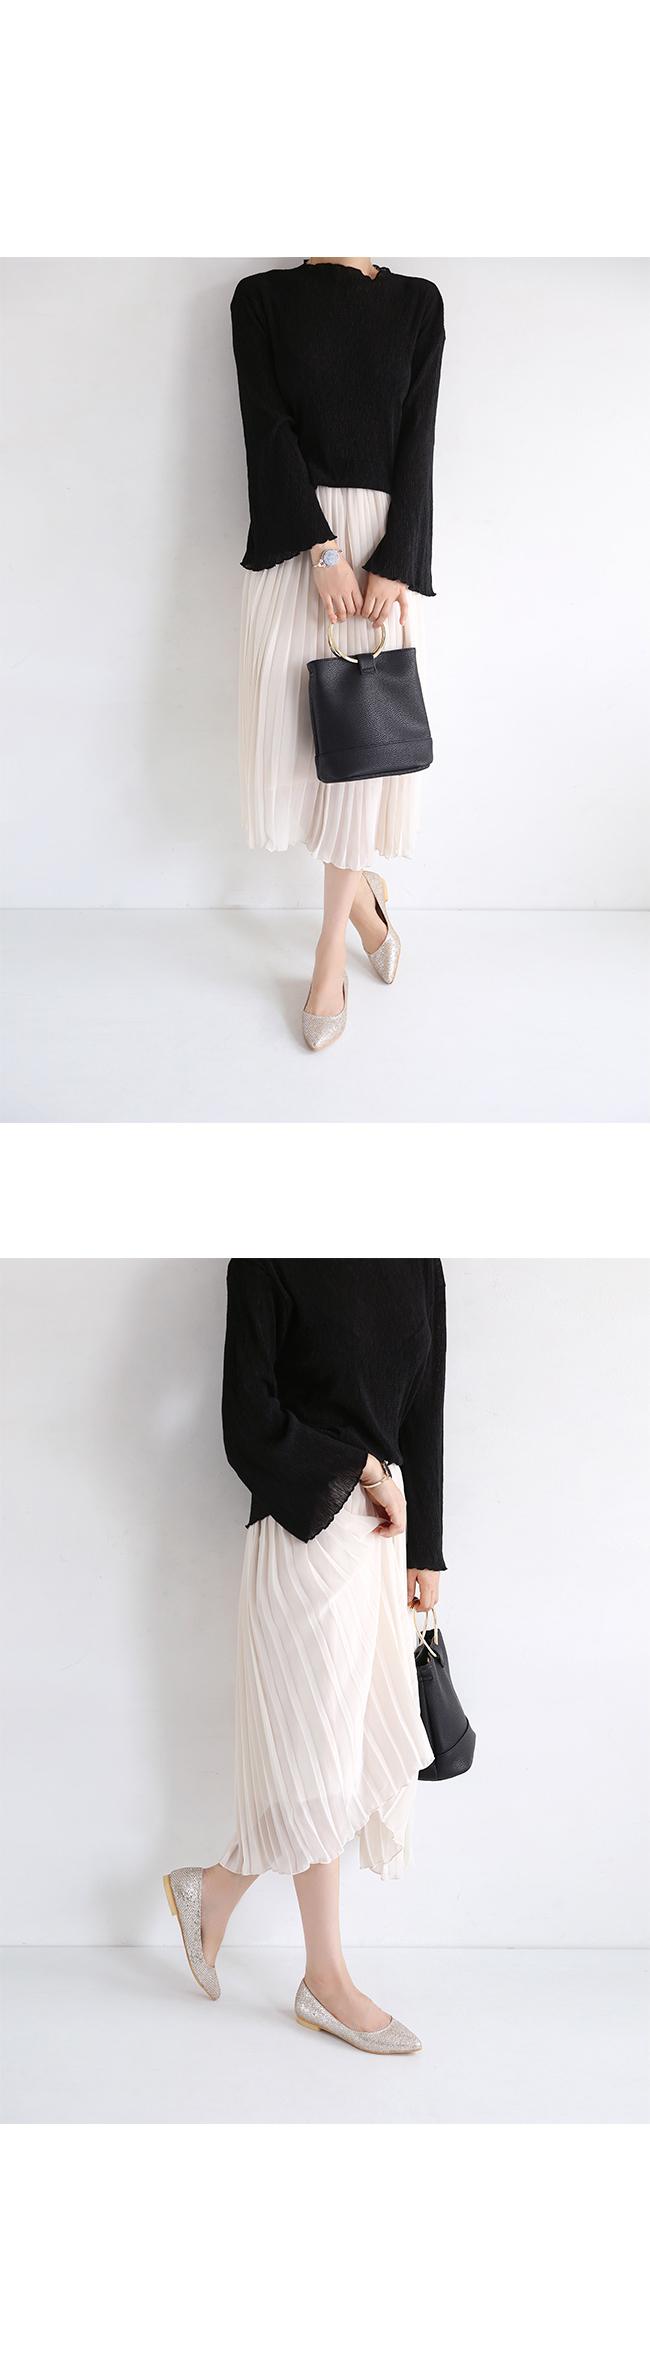 Shirin 1.5cm / 8cm Mono Barbie is free shipping